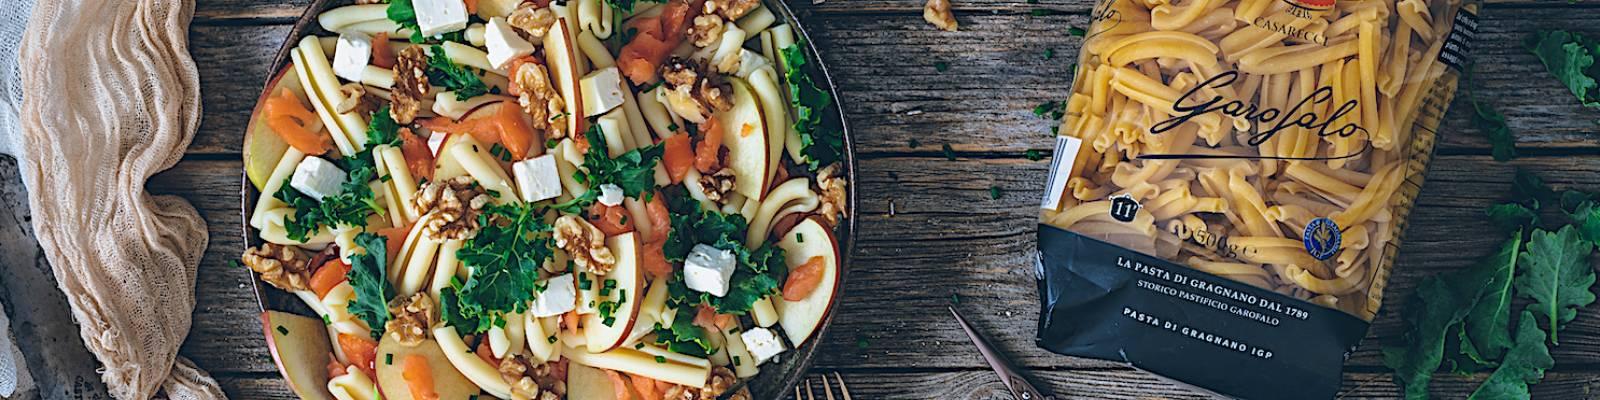 Pasta Garofalo - Casarecce salad with salmon and kale